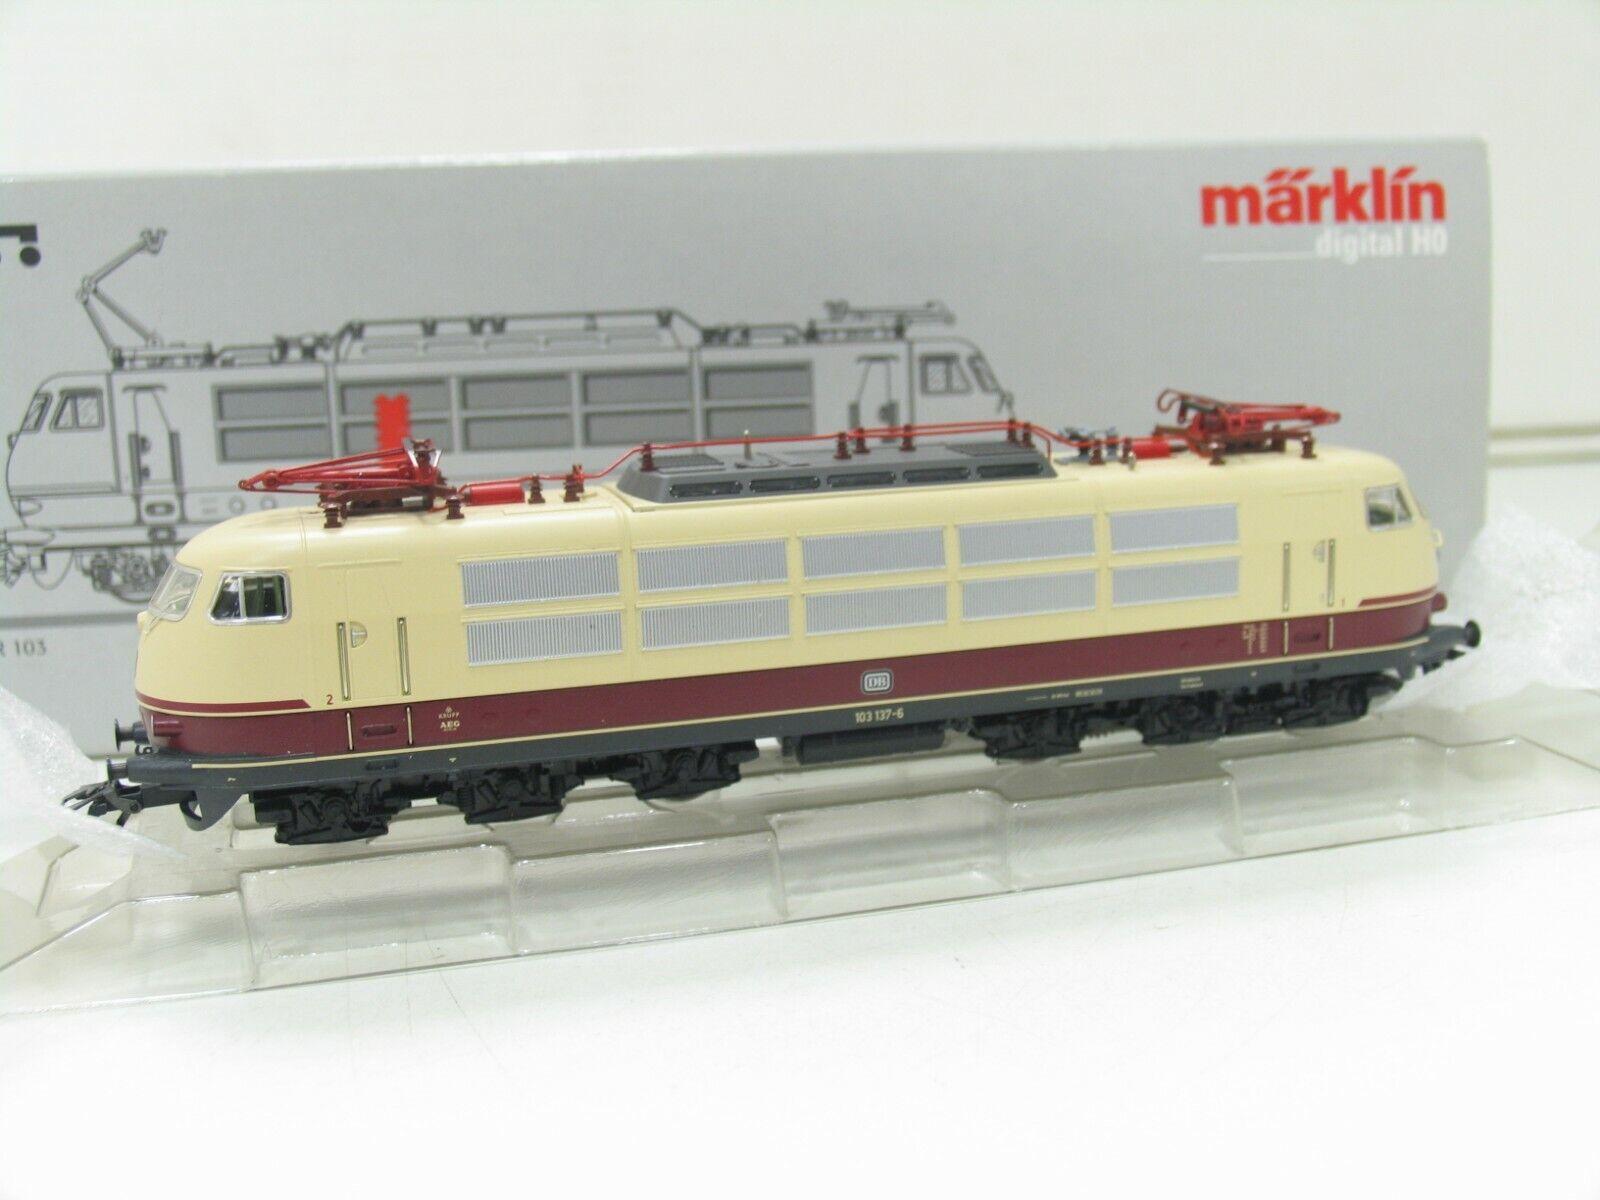 MÄRKLIN HAMO 39579 E-LOK BR 103 der DB SINUS DIGITAL UMBAU 2-LEITER  NH2498